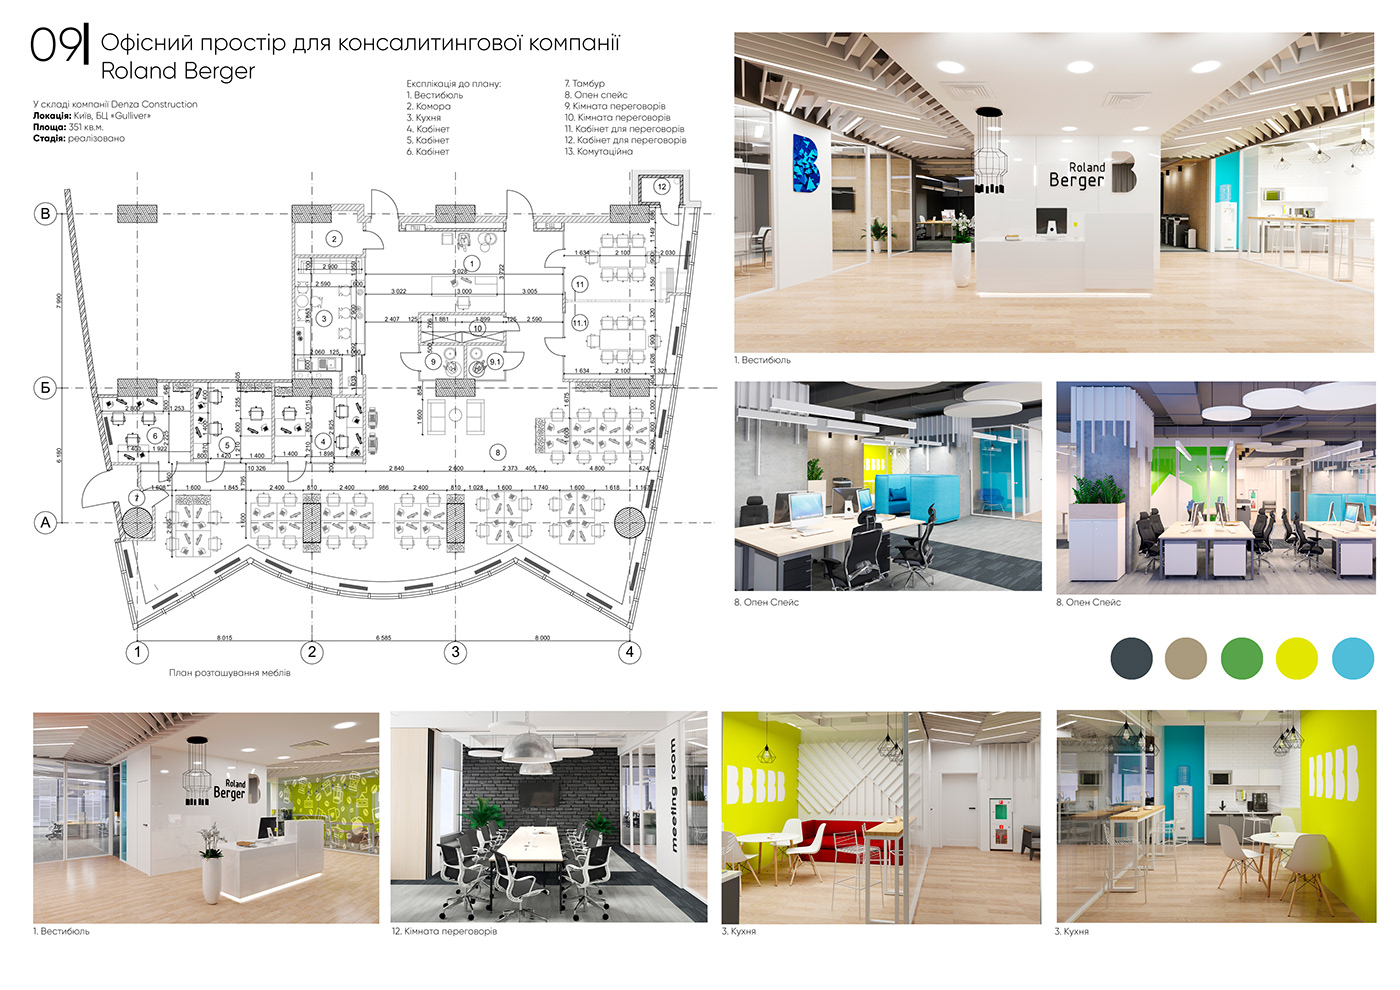 architect architecture design Drafts Interior interiordesigner Office Officedesigne Vizualization